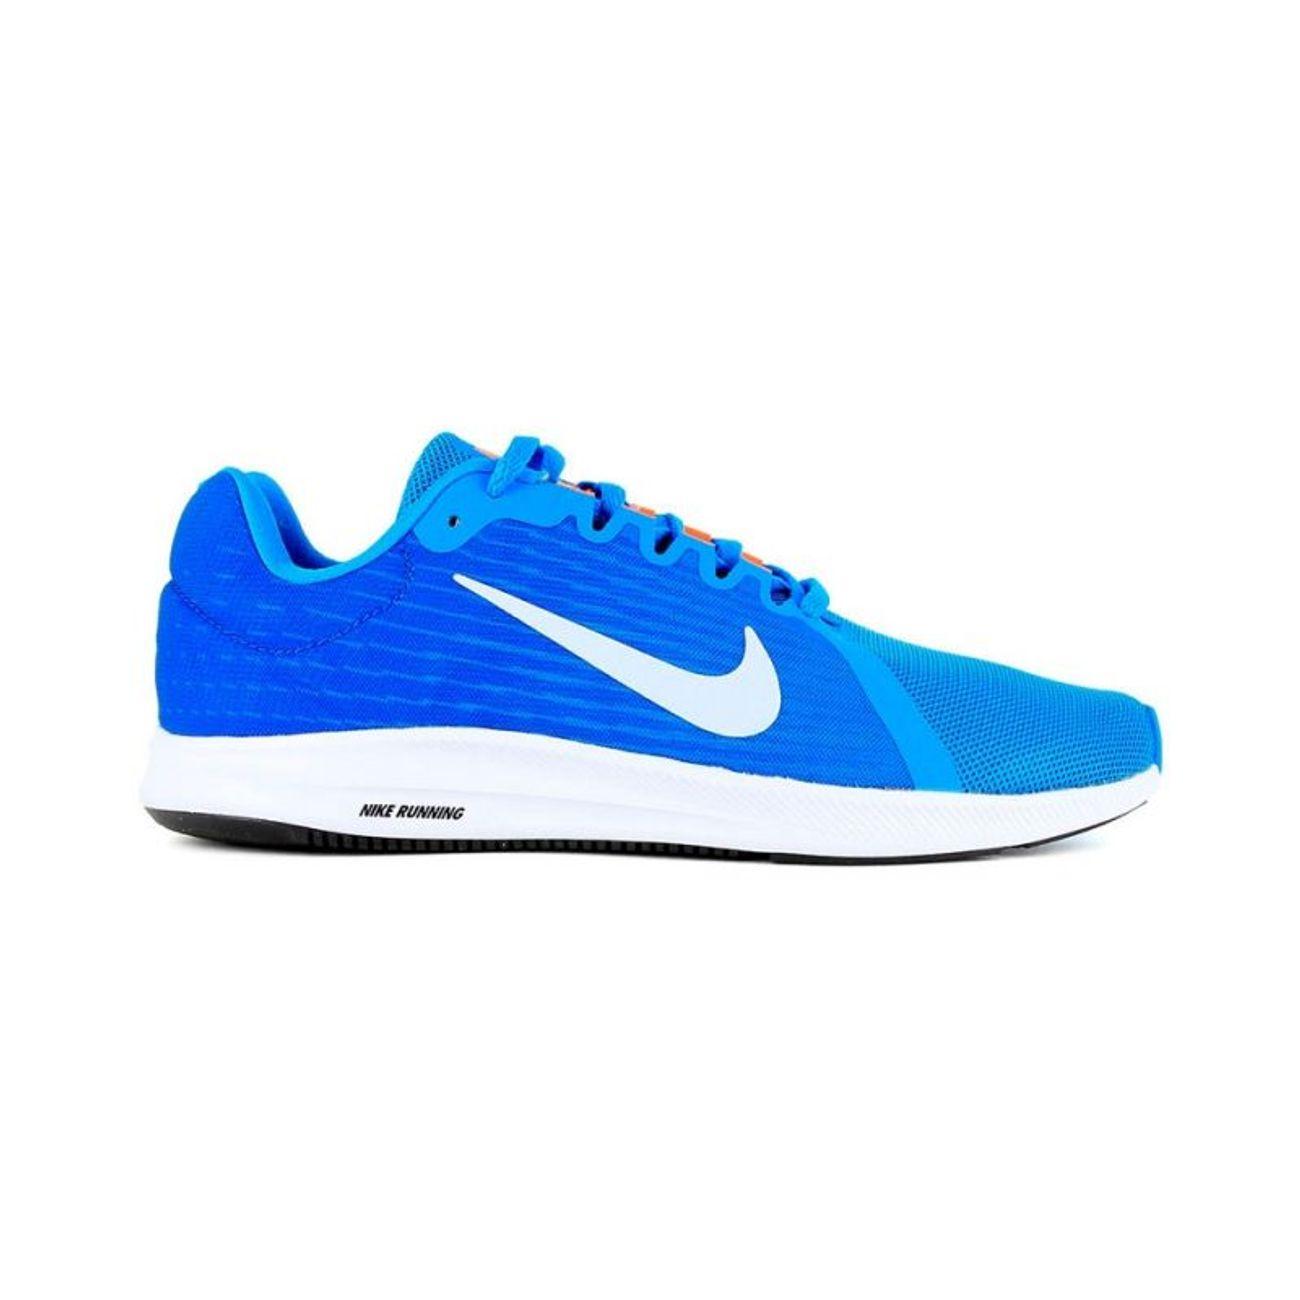 Nike Downshifter 8 Ni908984 403 Marine Padel Adulte Bleu NvOym8n0w